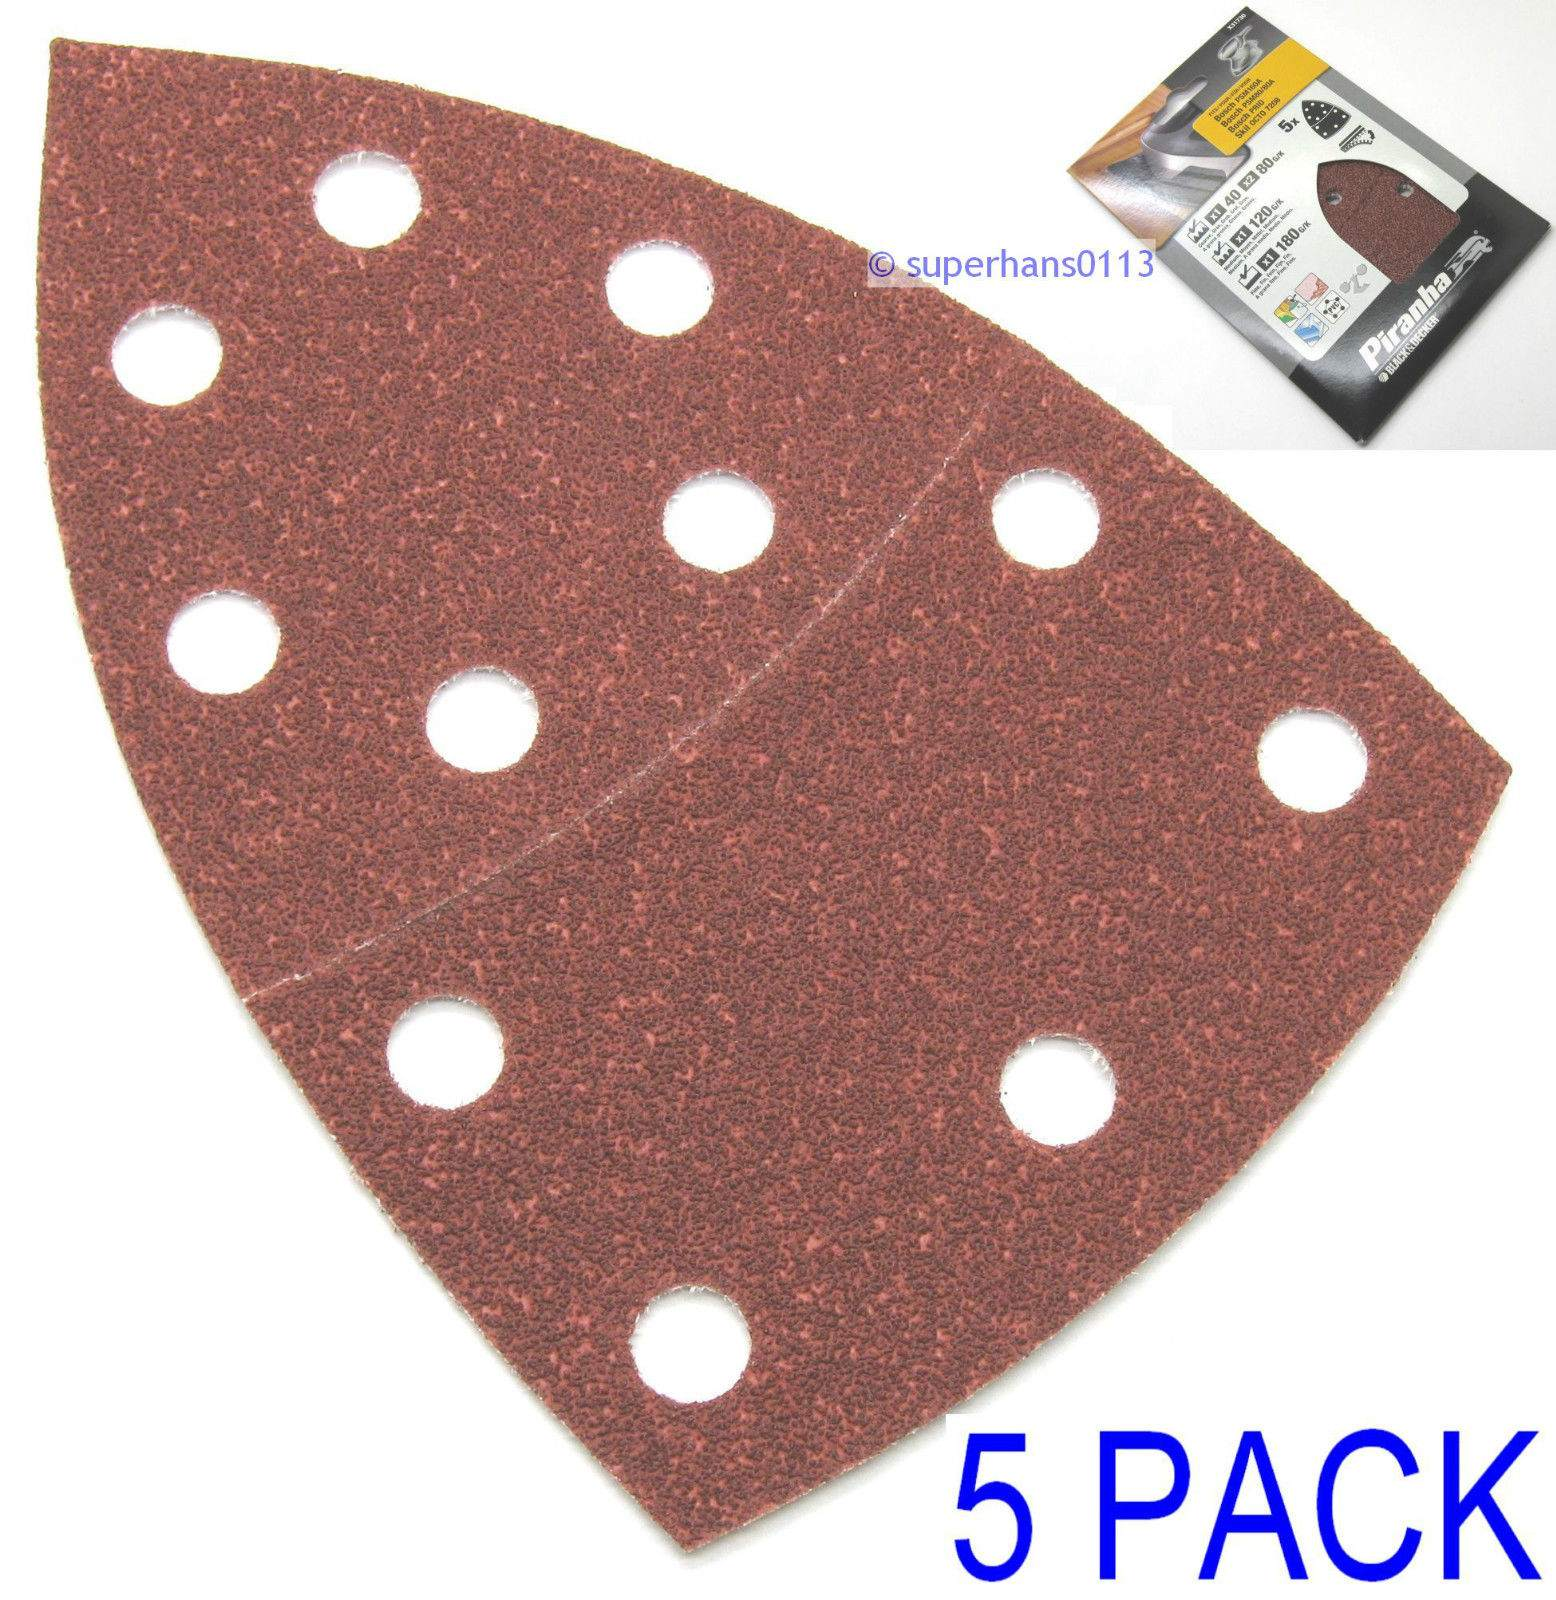 5pcs/set 150mm Sanding Sheets Paper For Palm Detail Sander 40/80/120/180 Grit For Wood Paint